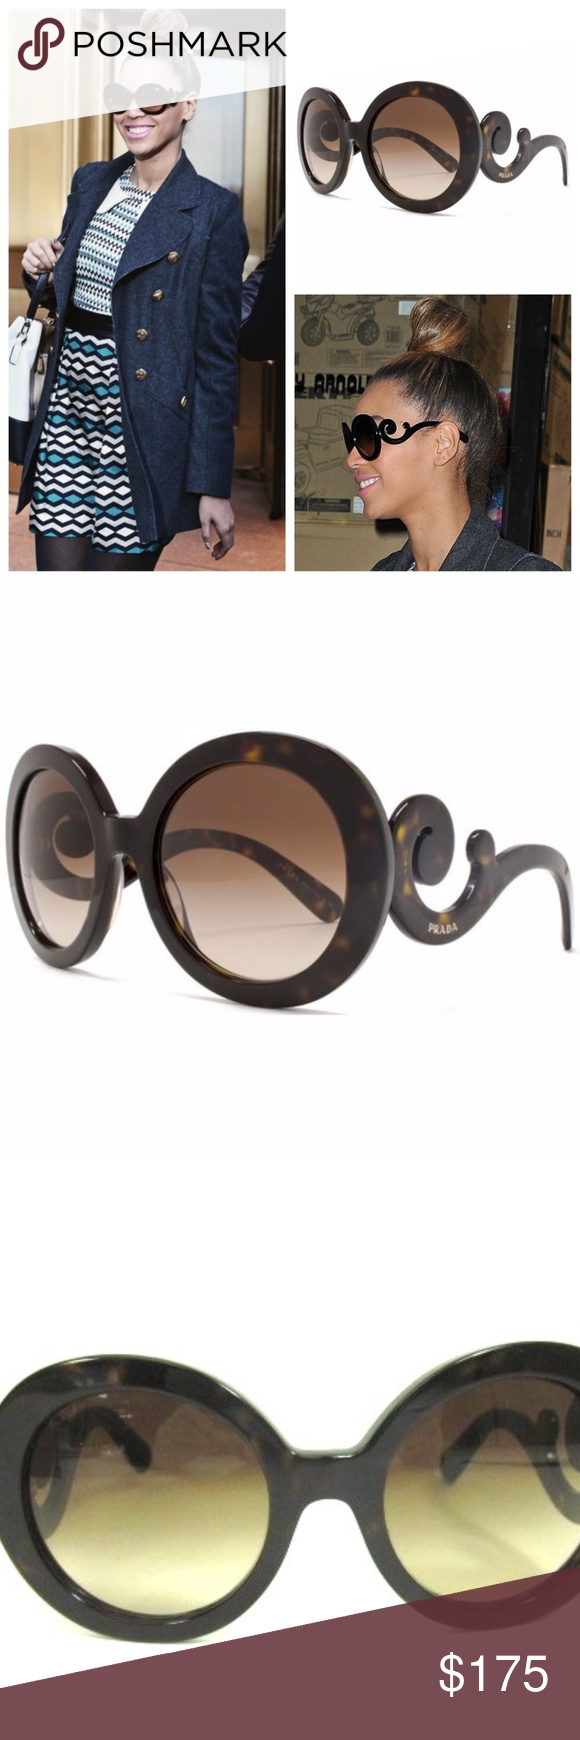 80ebd12dda42 PRADA Minimal Baroque Tortoise Shell Sunglasses Authentic Gorgeous preloved  condition Prada PR 27NS - Minimal Baroque